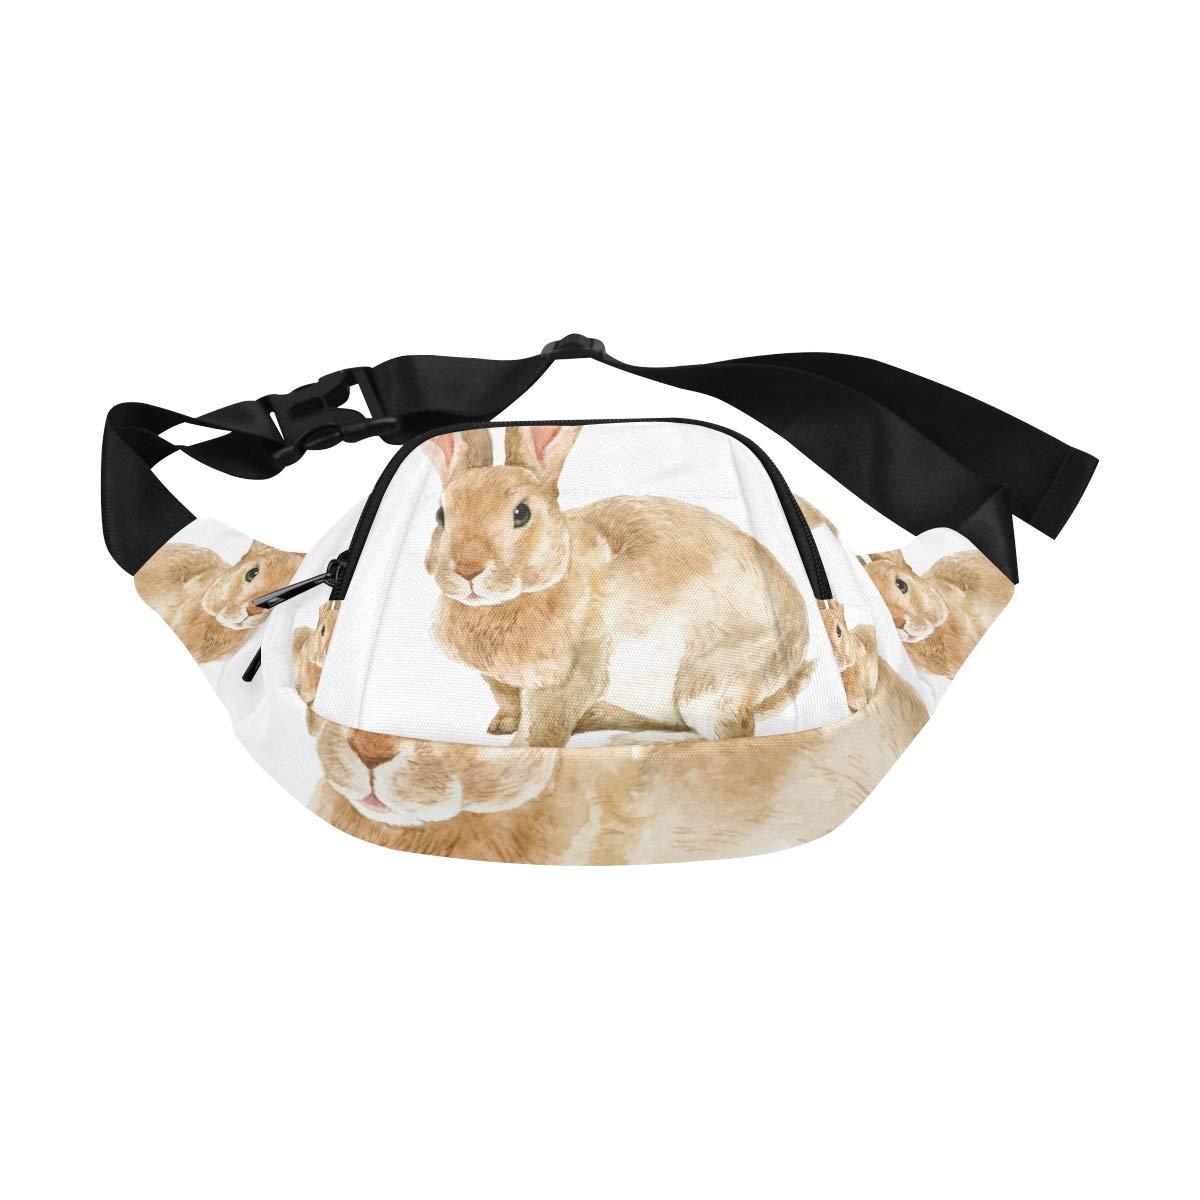 Cute Brown Rabbit Among The Flowers Fenny Packs Waist Bags Adjustable Belt Waterproof Nylon Travel Running Sport Vacation Party For Men Women Boys Girls Kids